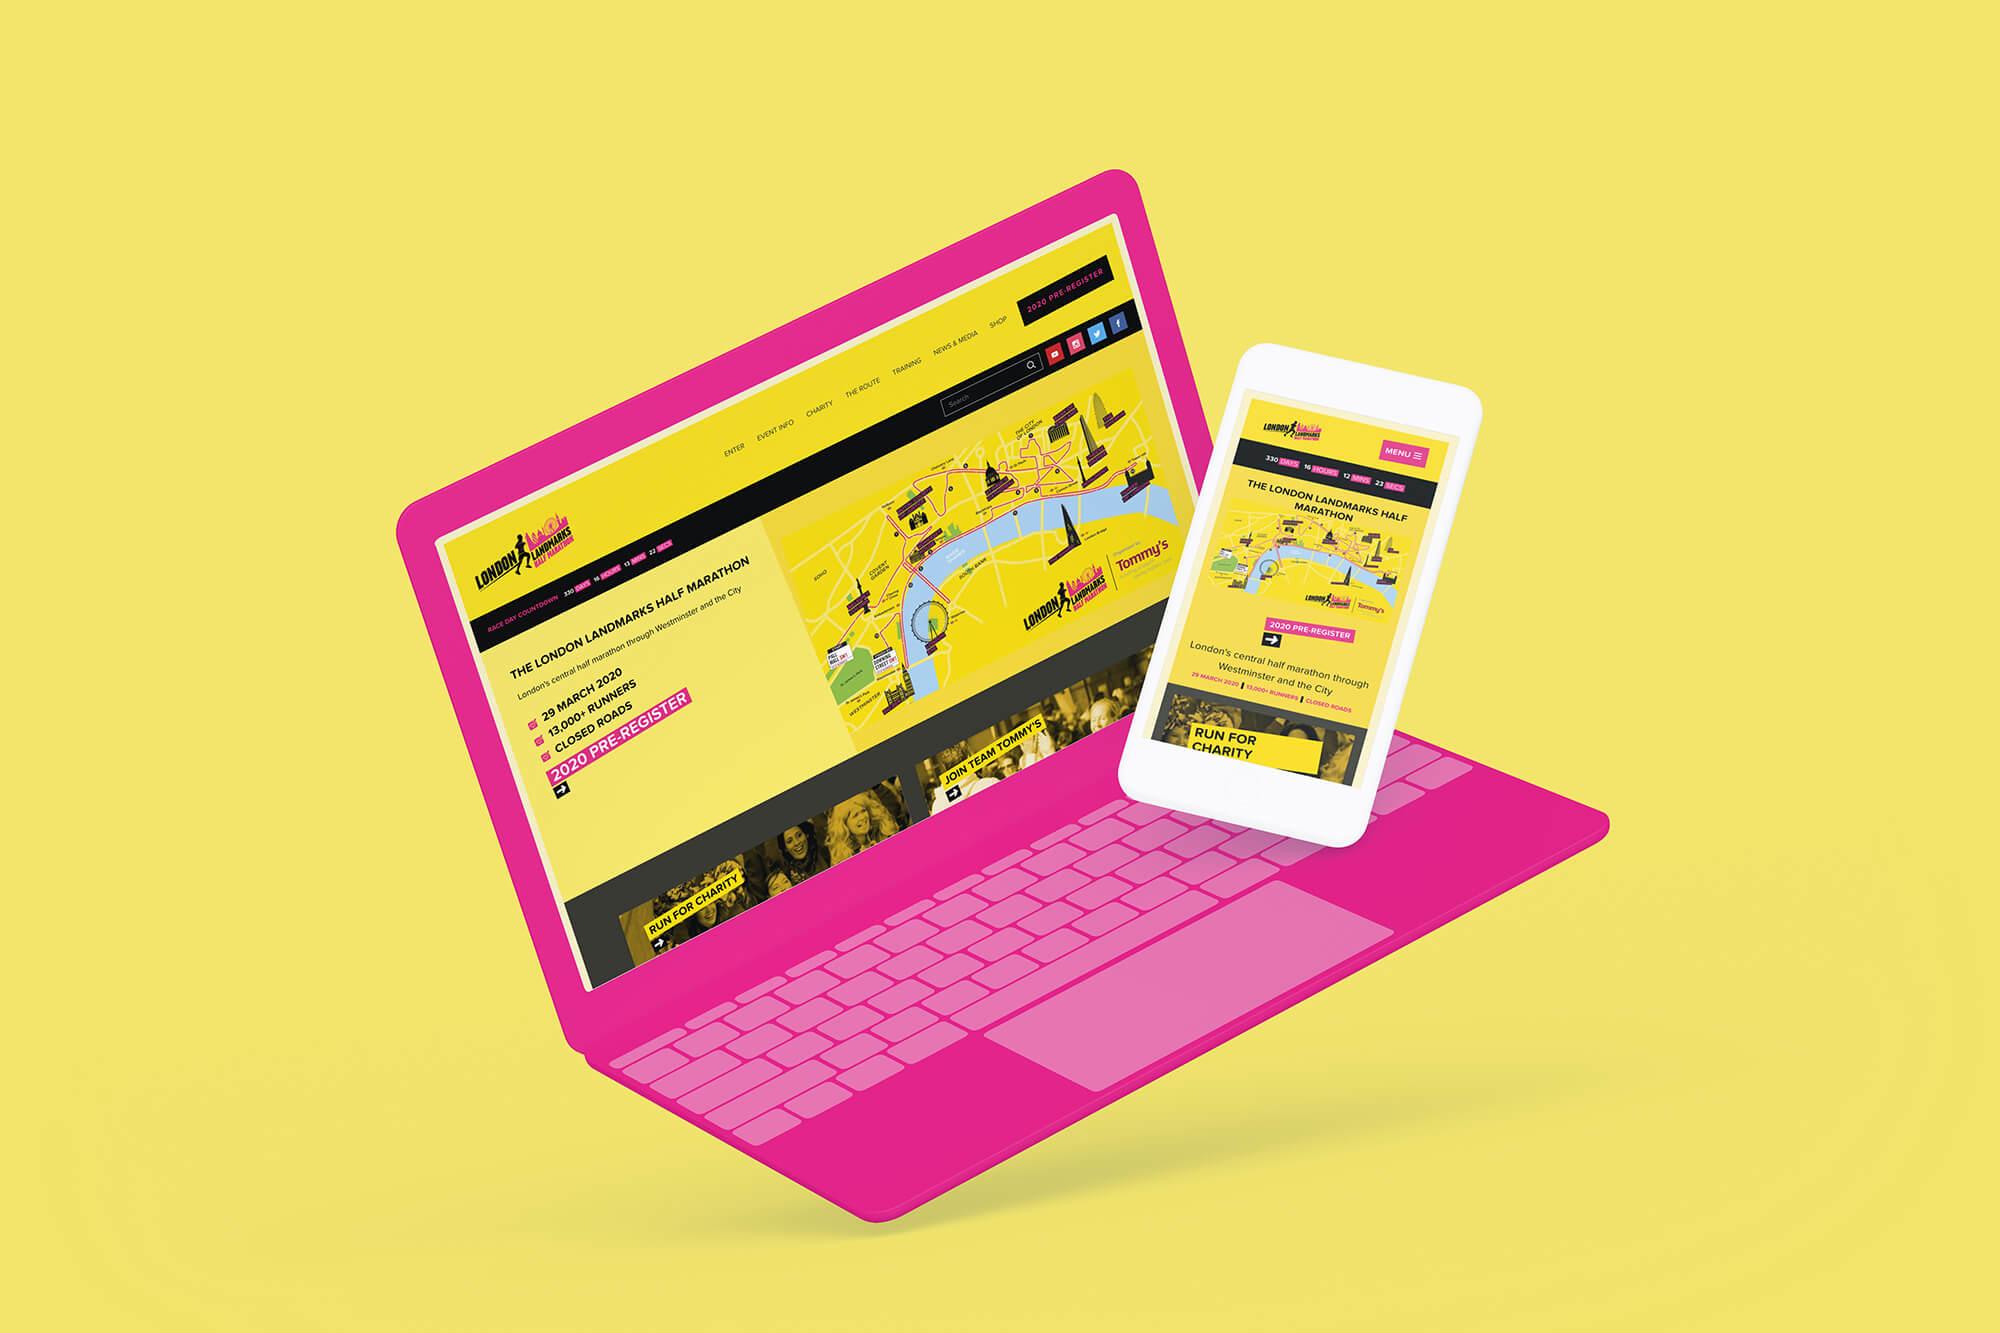 London Landmarks Half Marathon website mobile view